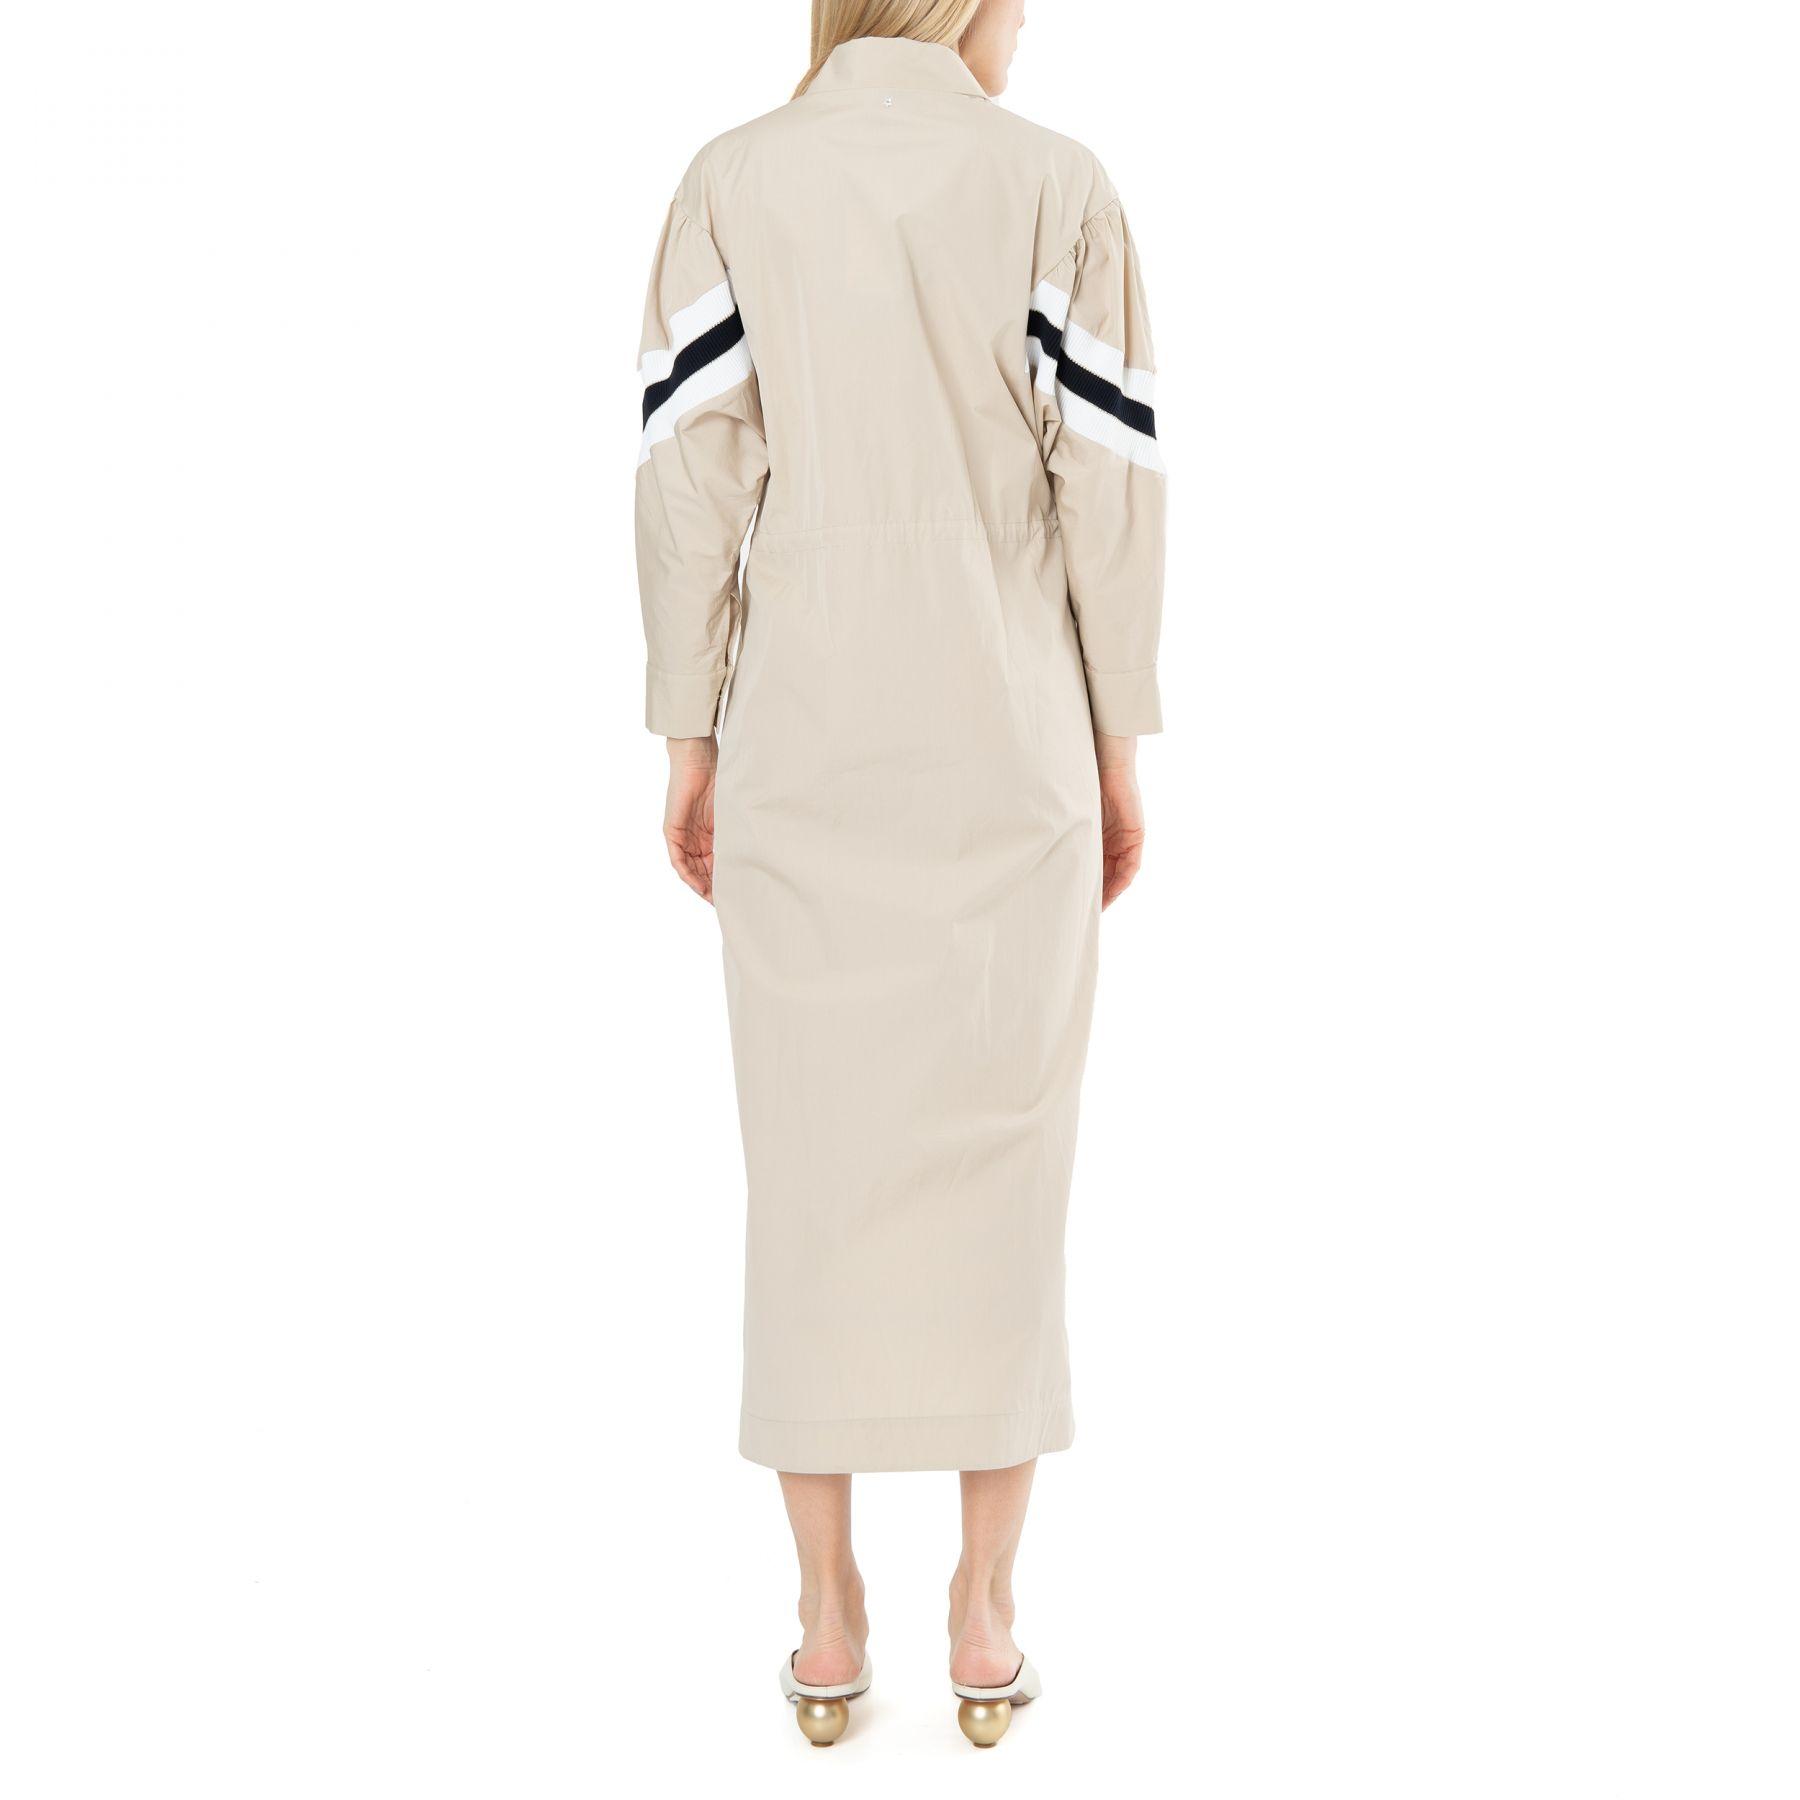 Платье длинное Lorena Antoniazzi бежевое